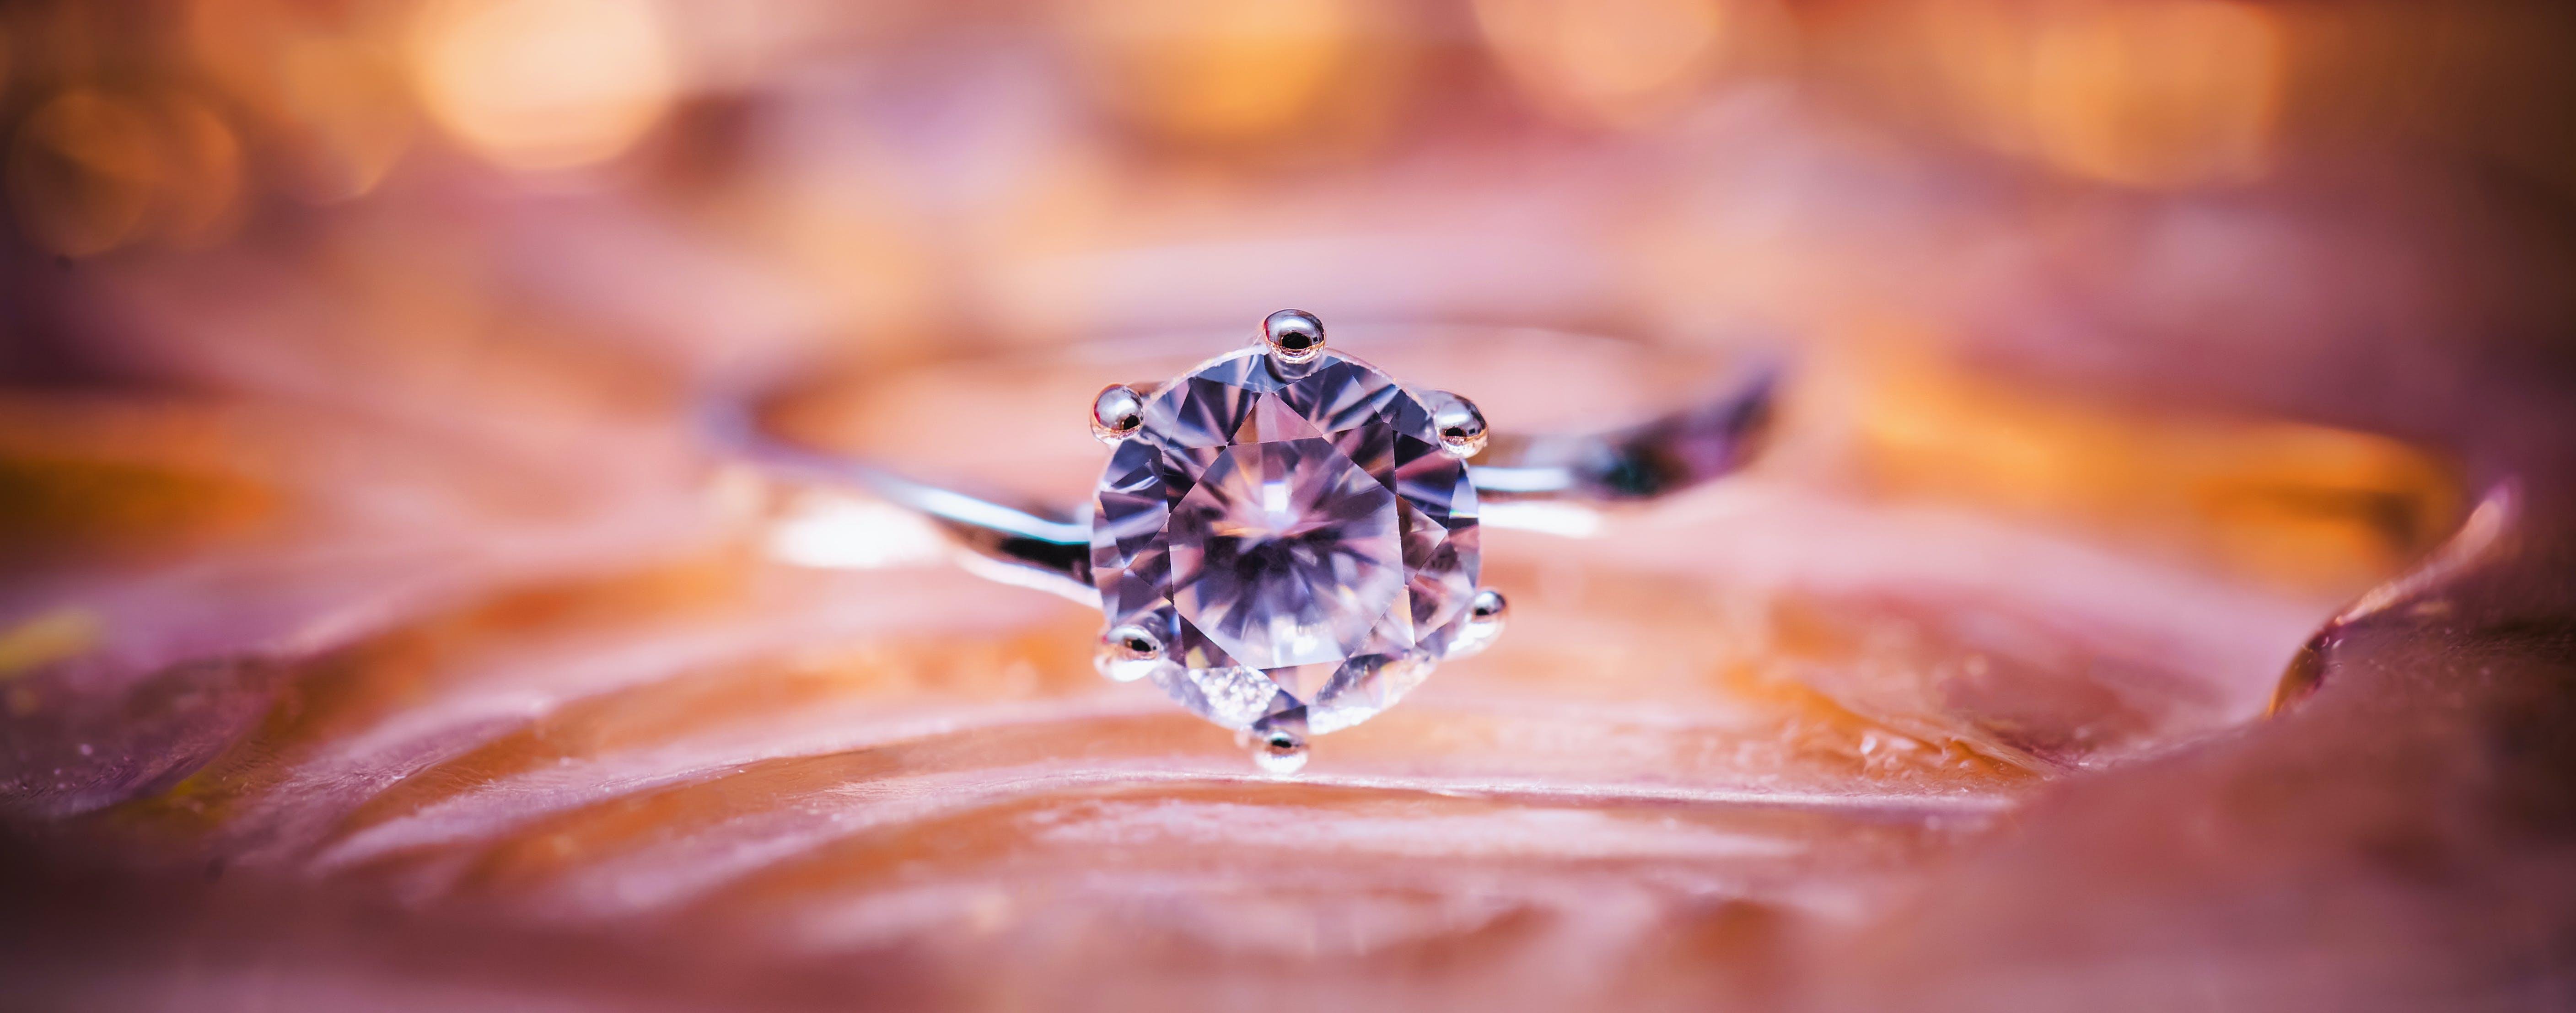 Kostenloses Stock Foto zu makro, ring, schmuck, diamant